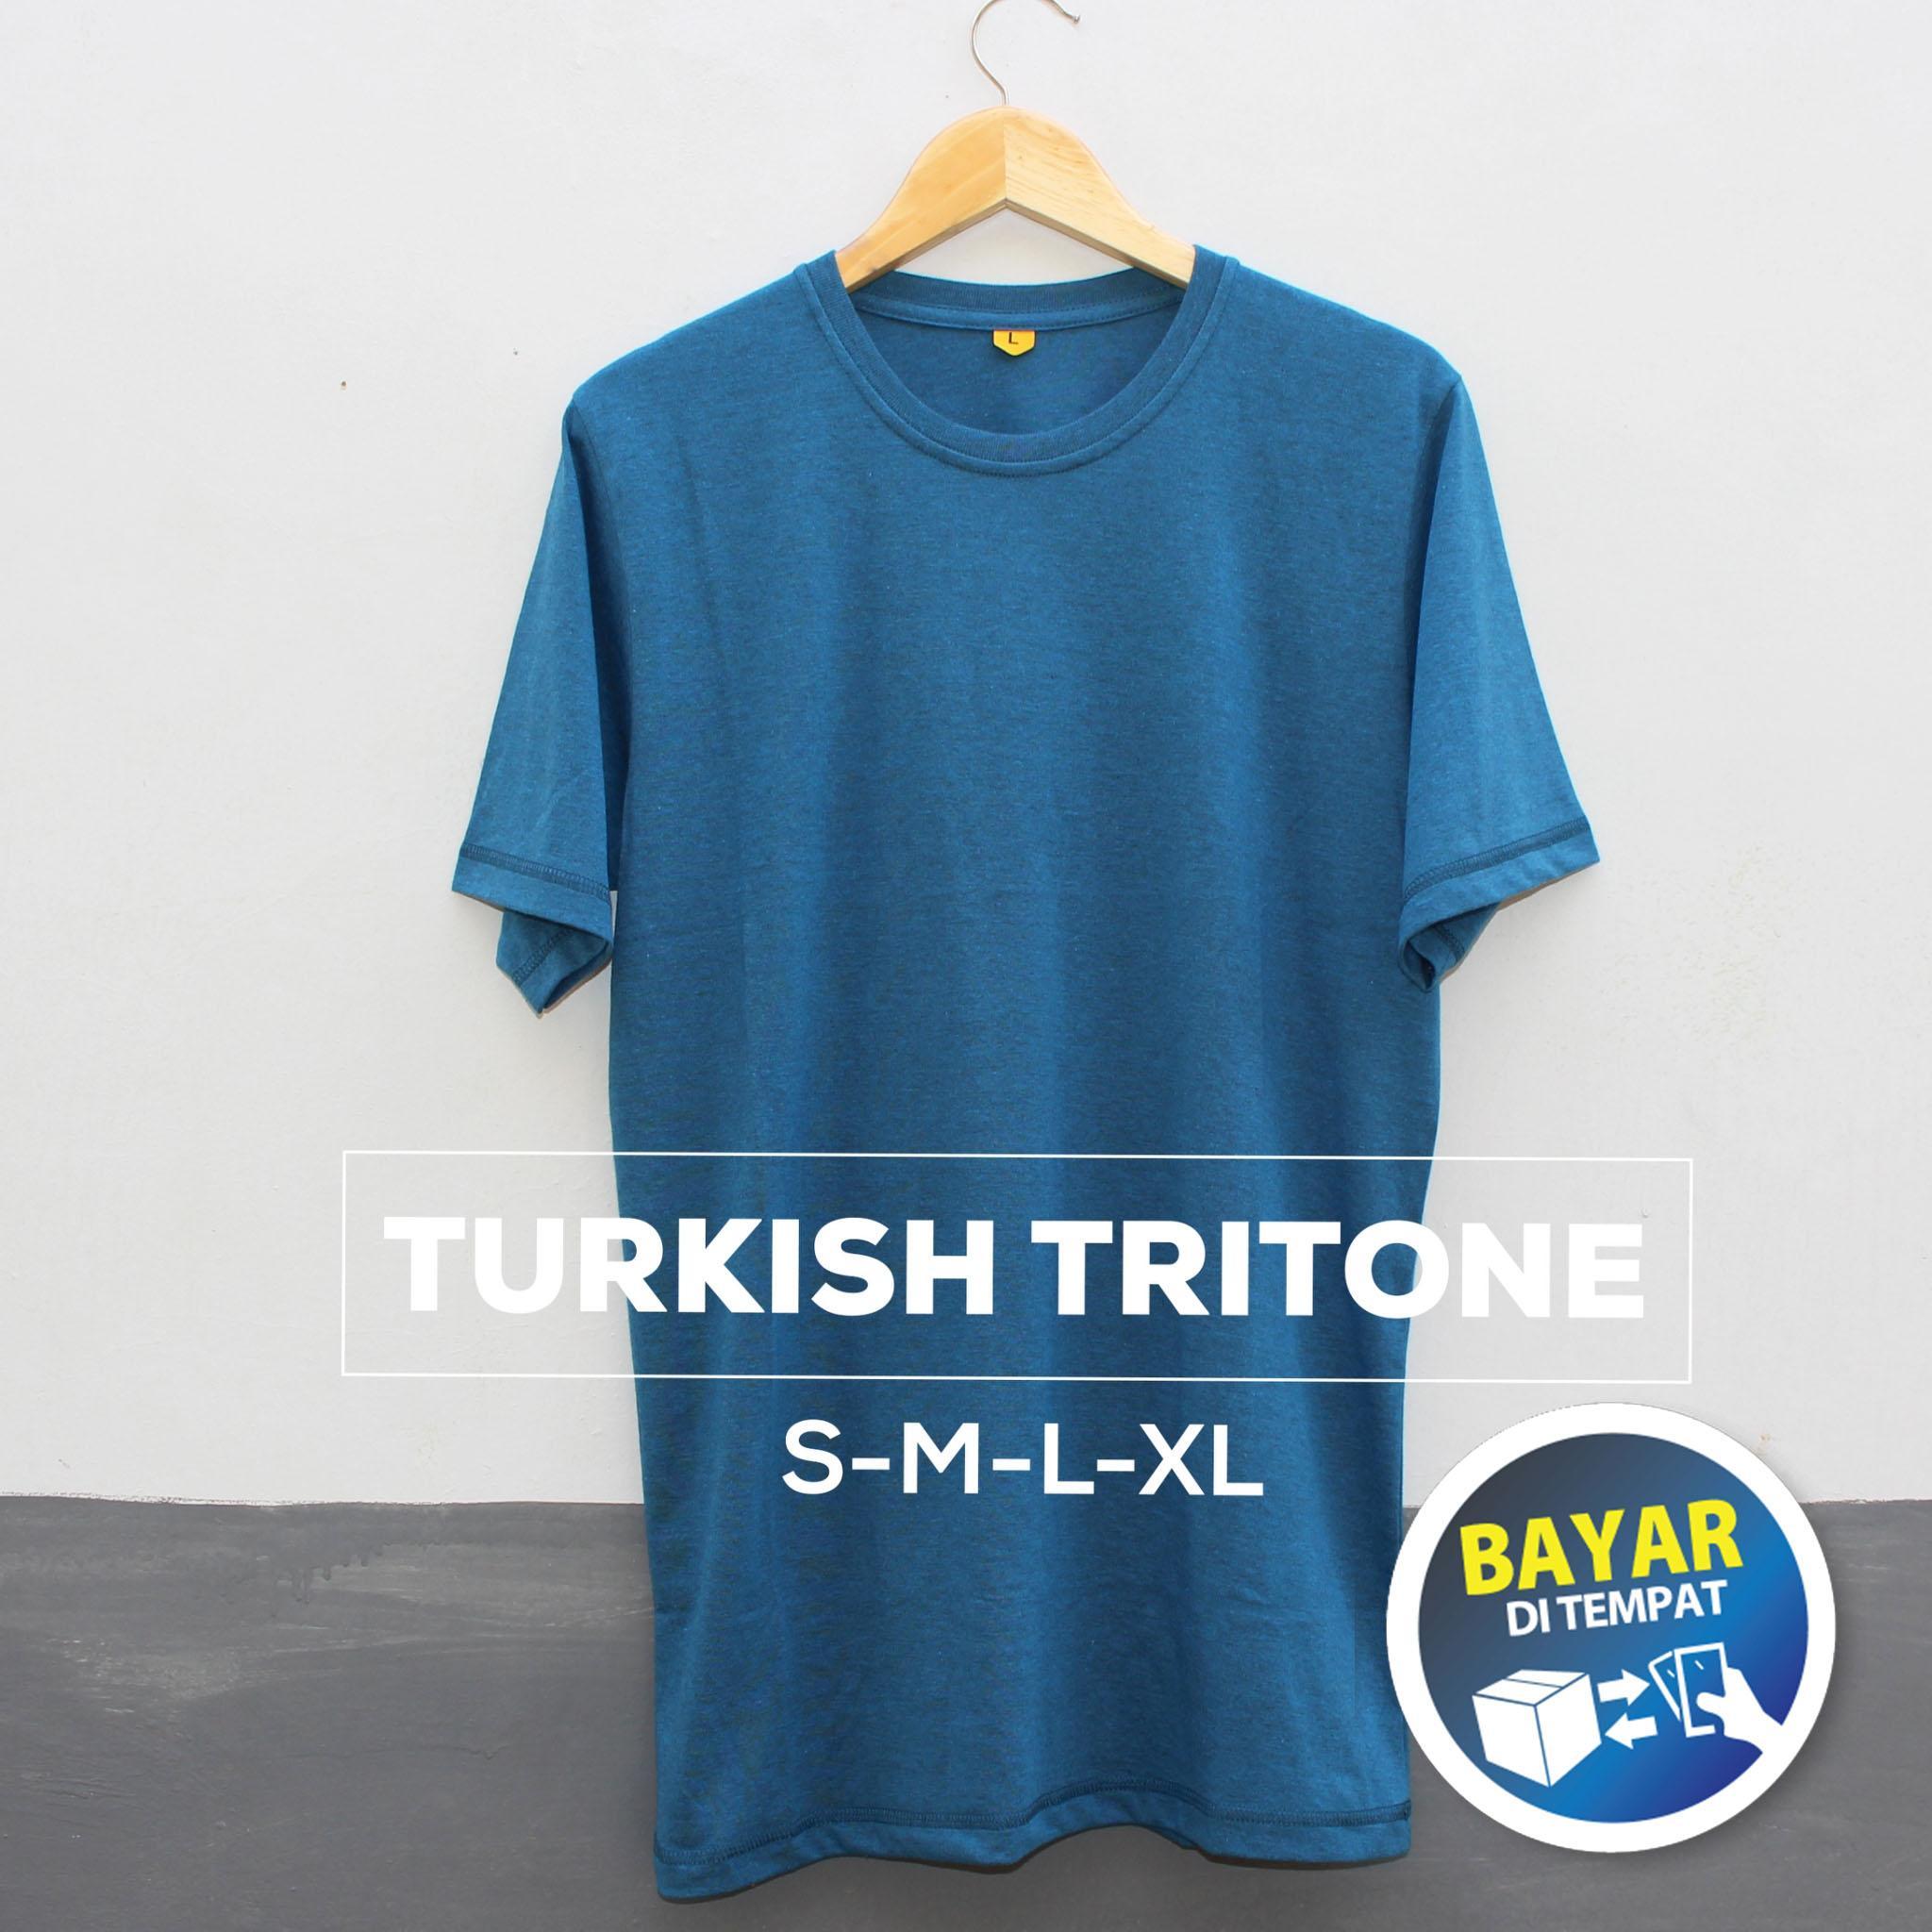 Baju Kaos Polos Oblong Bandung TURKISH TRITONE Biru Turkis Cewek Cowok